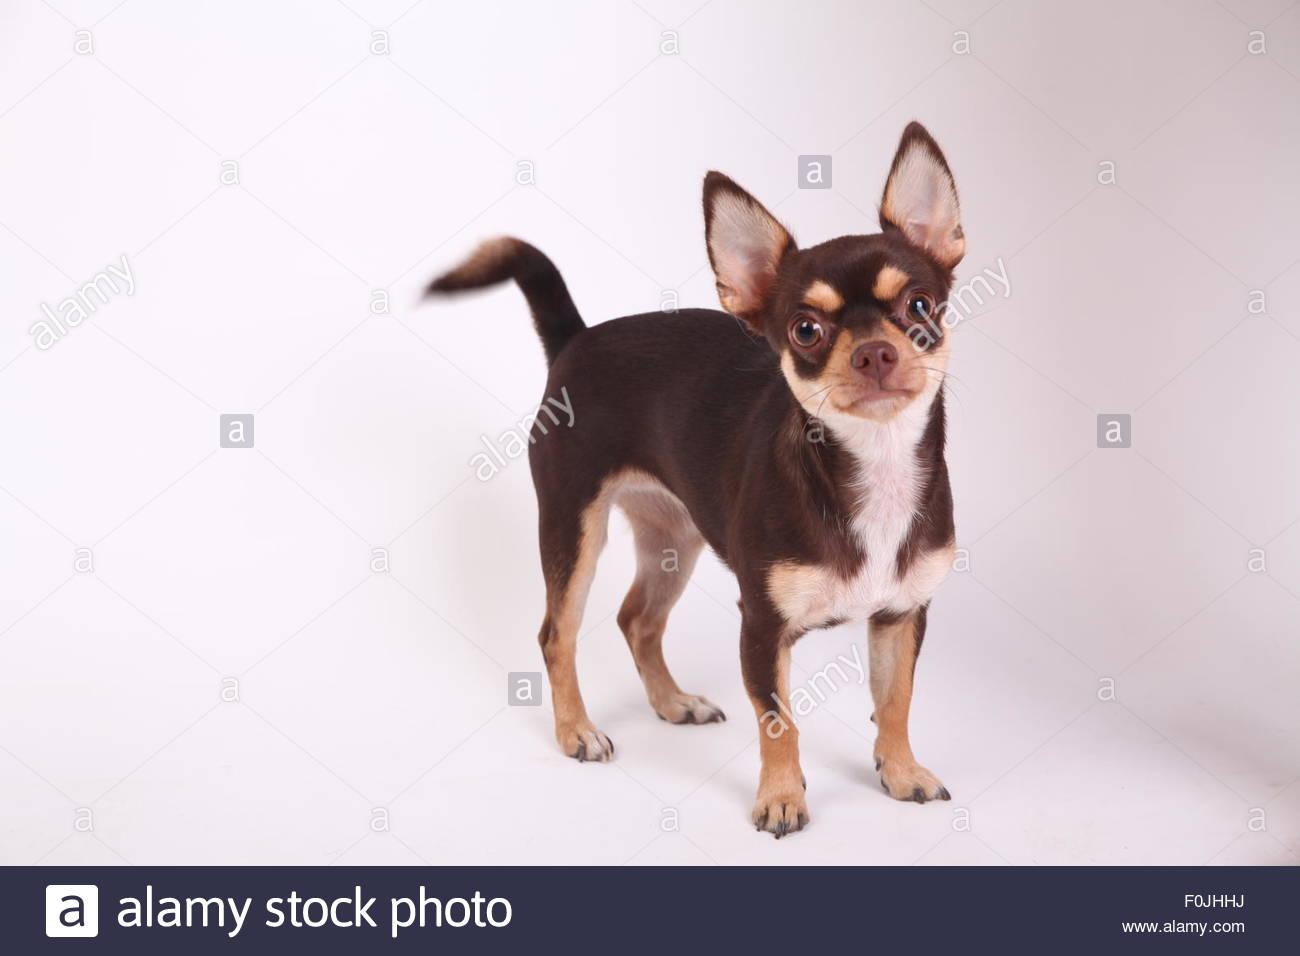 Best friend - Stock Image